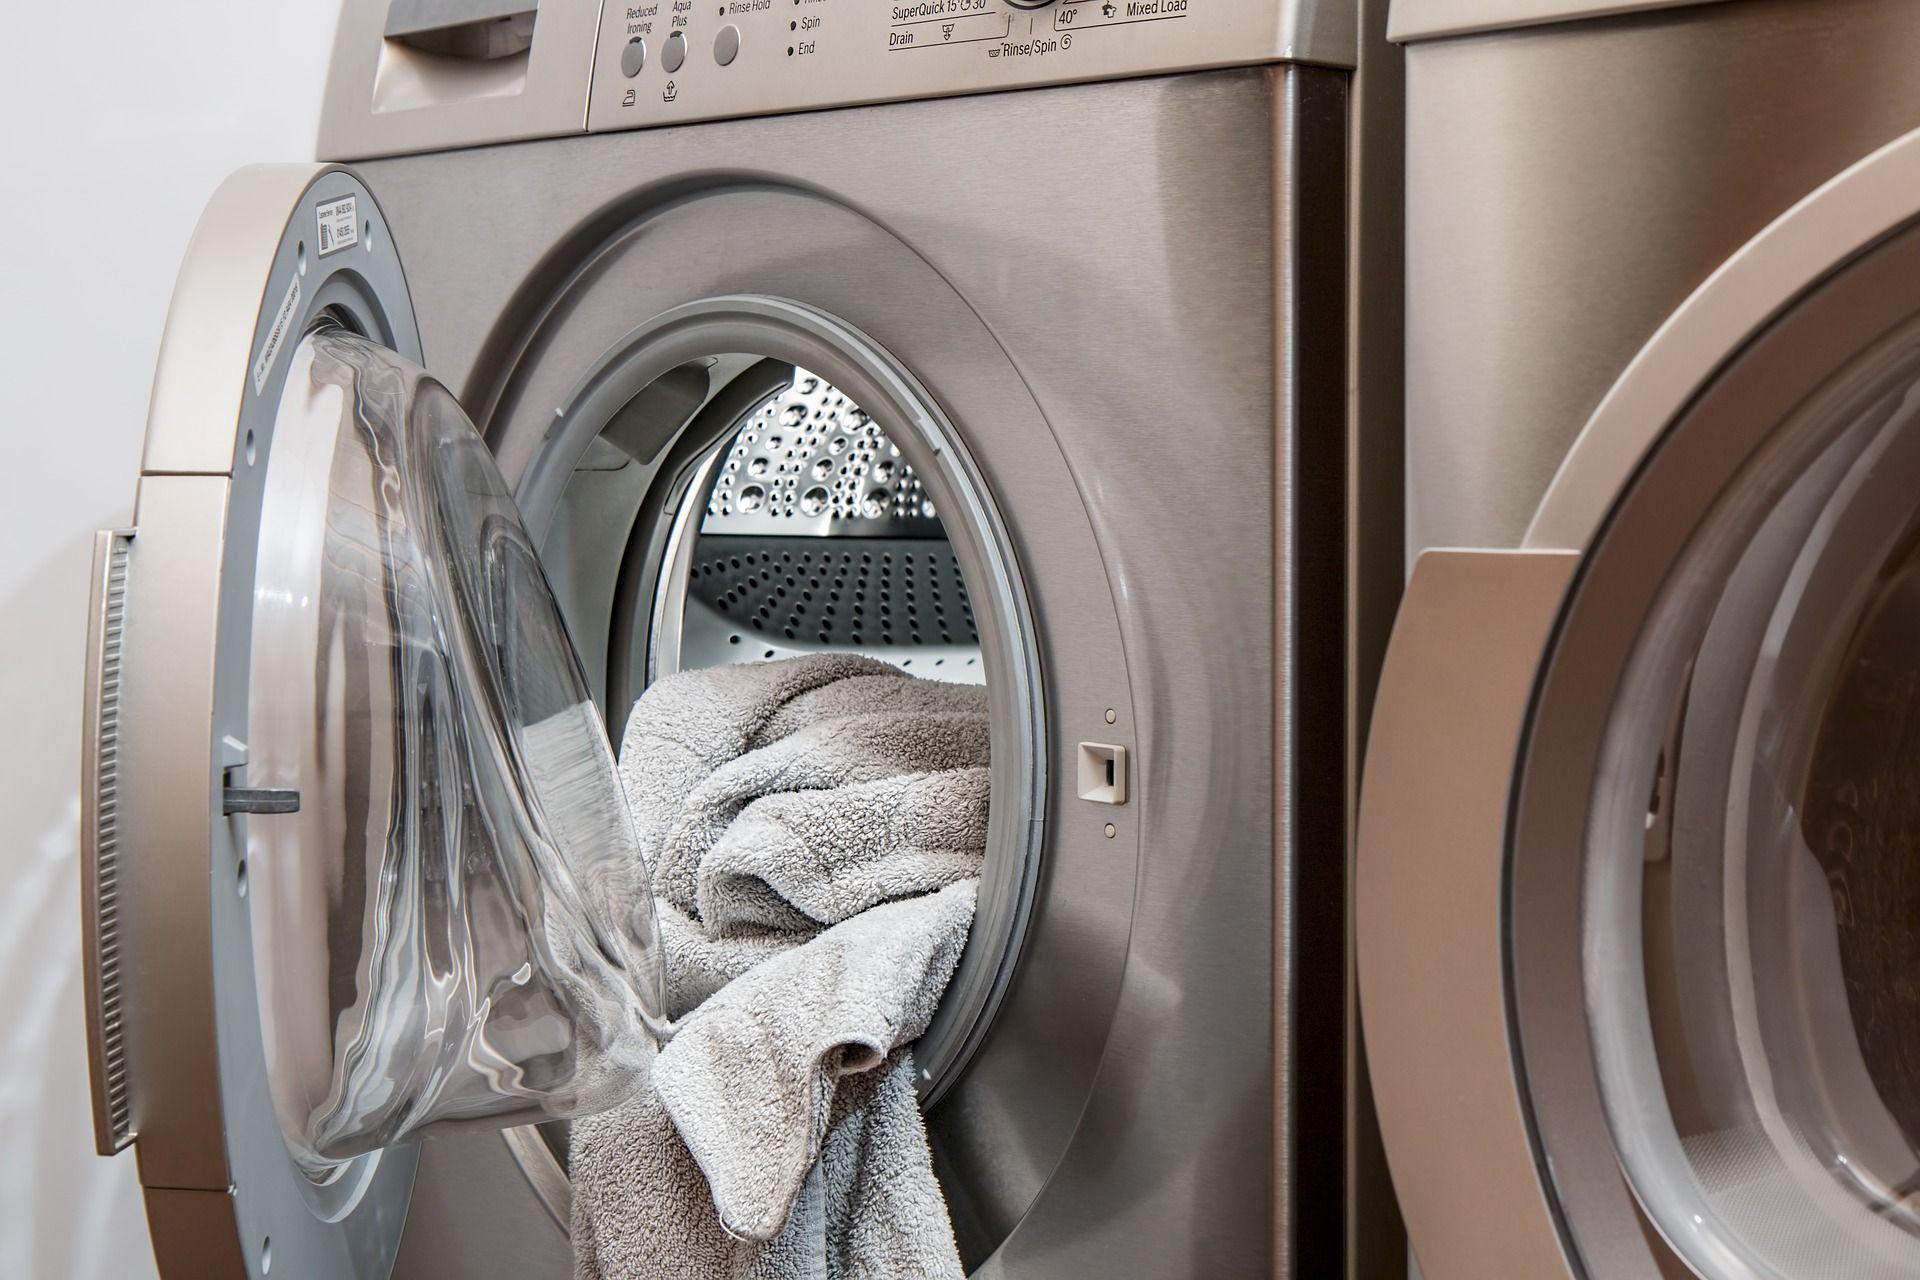 Washing machine and towel